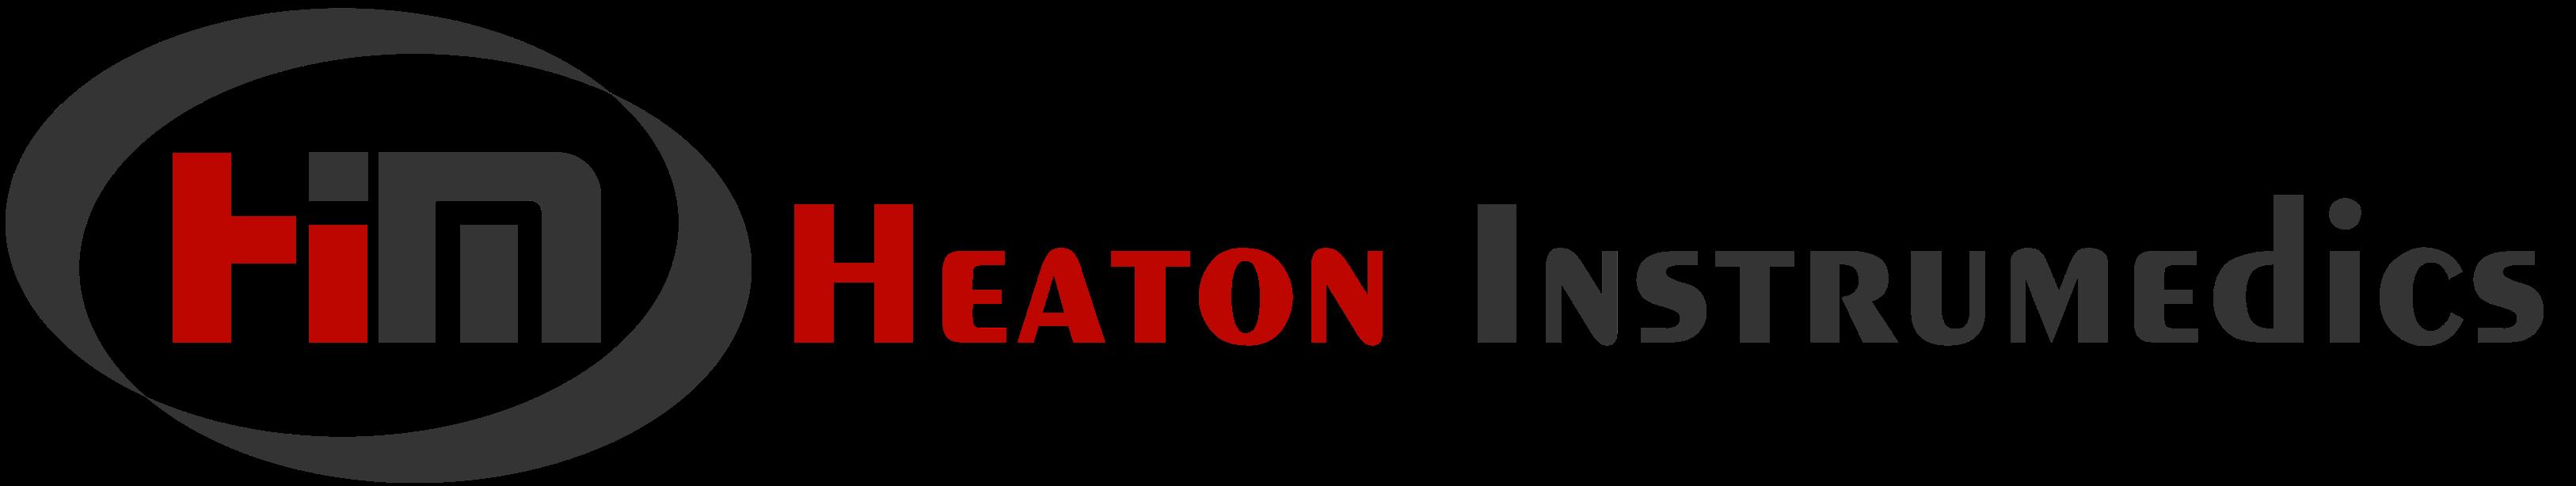 Heaton Instrumedics